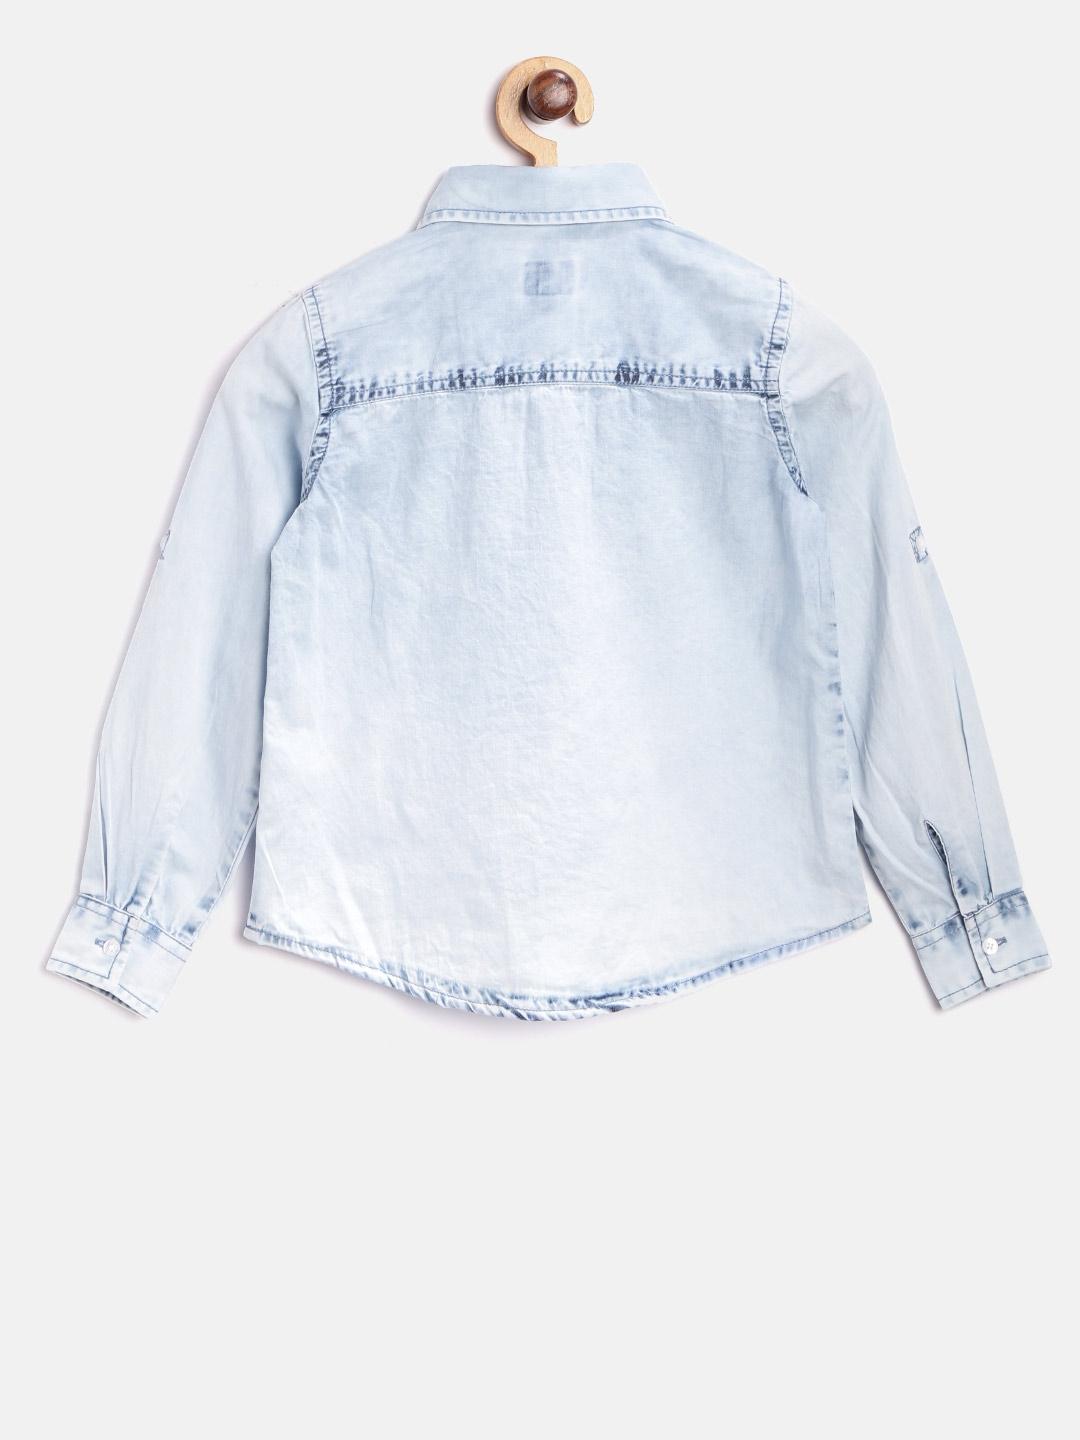 Buy Pepe Jeans Girls Blue Regular Fit Washed Denim Shirt Shirts